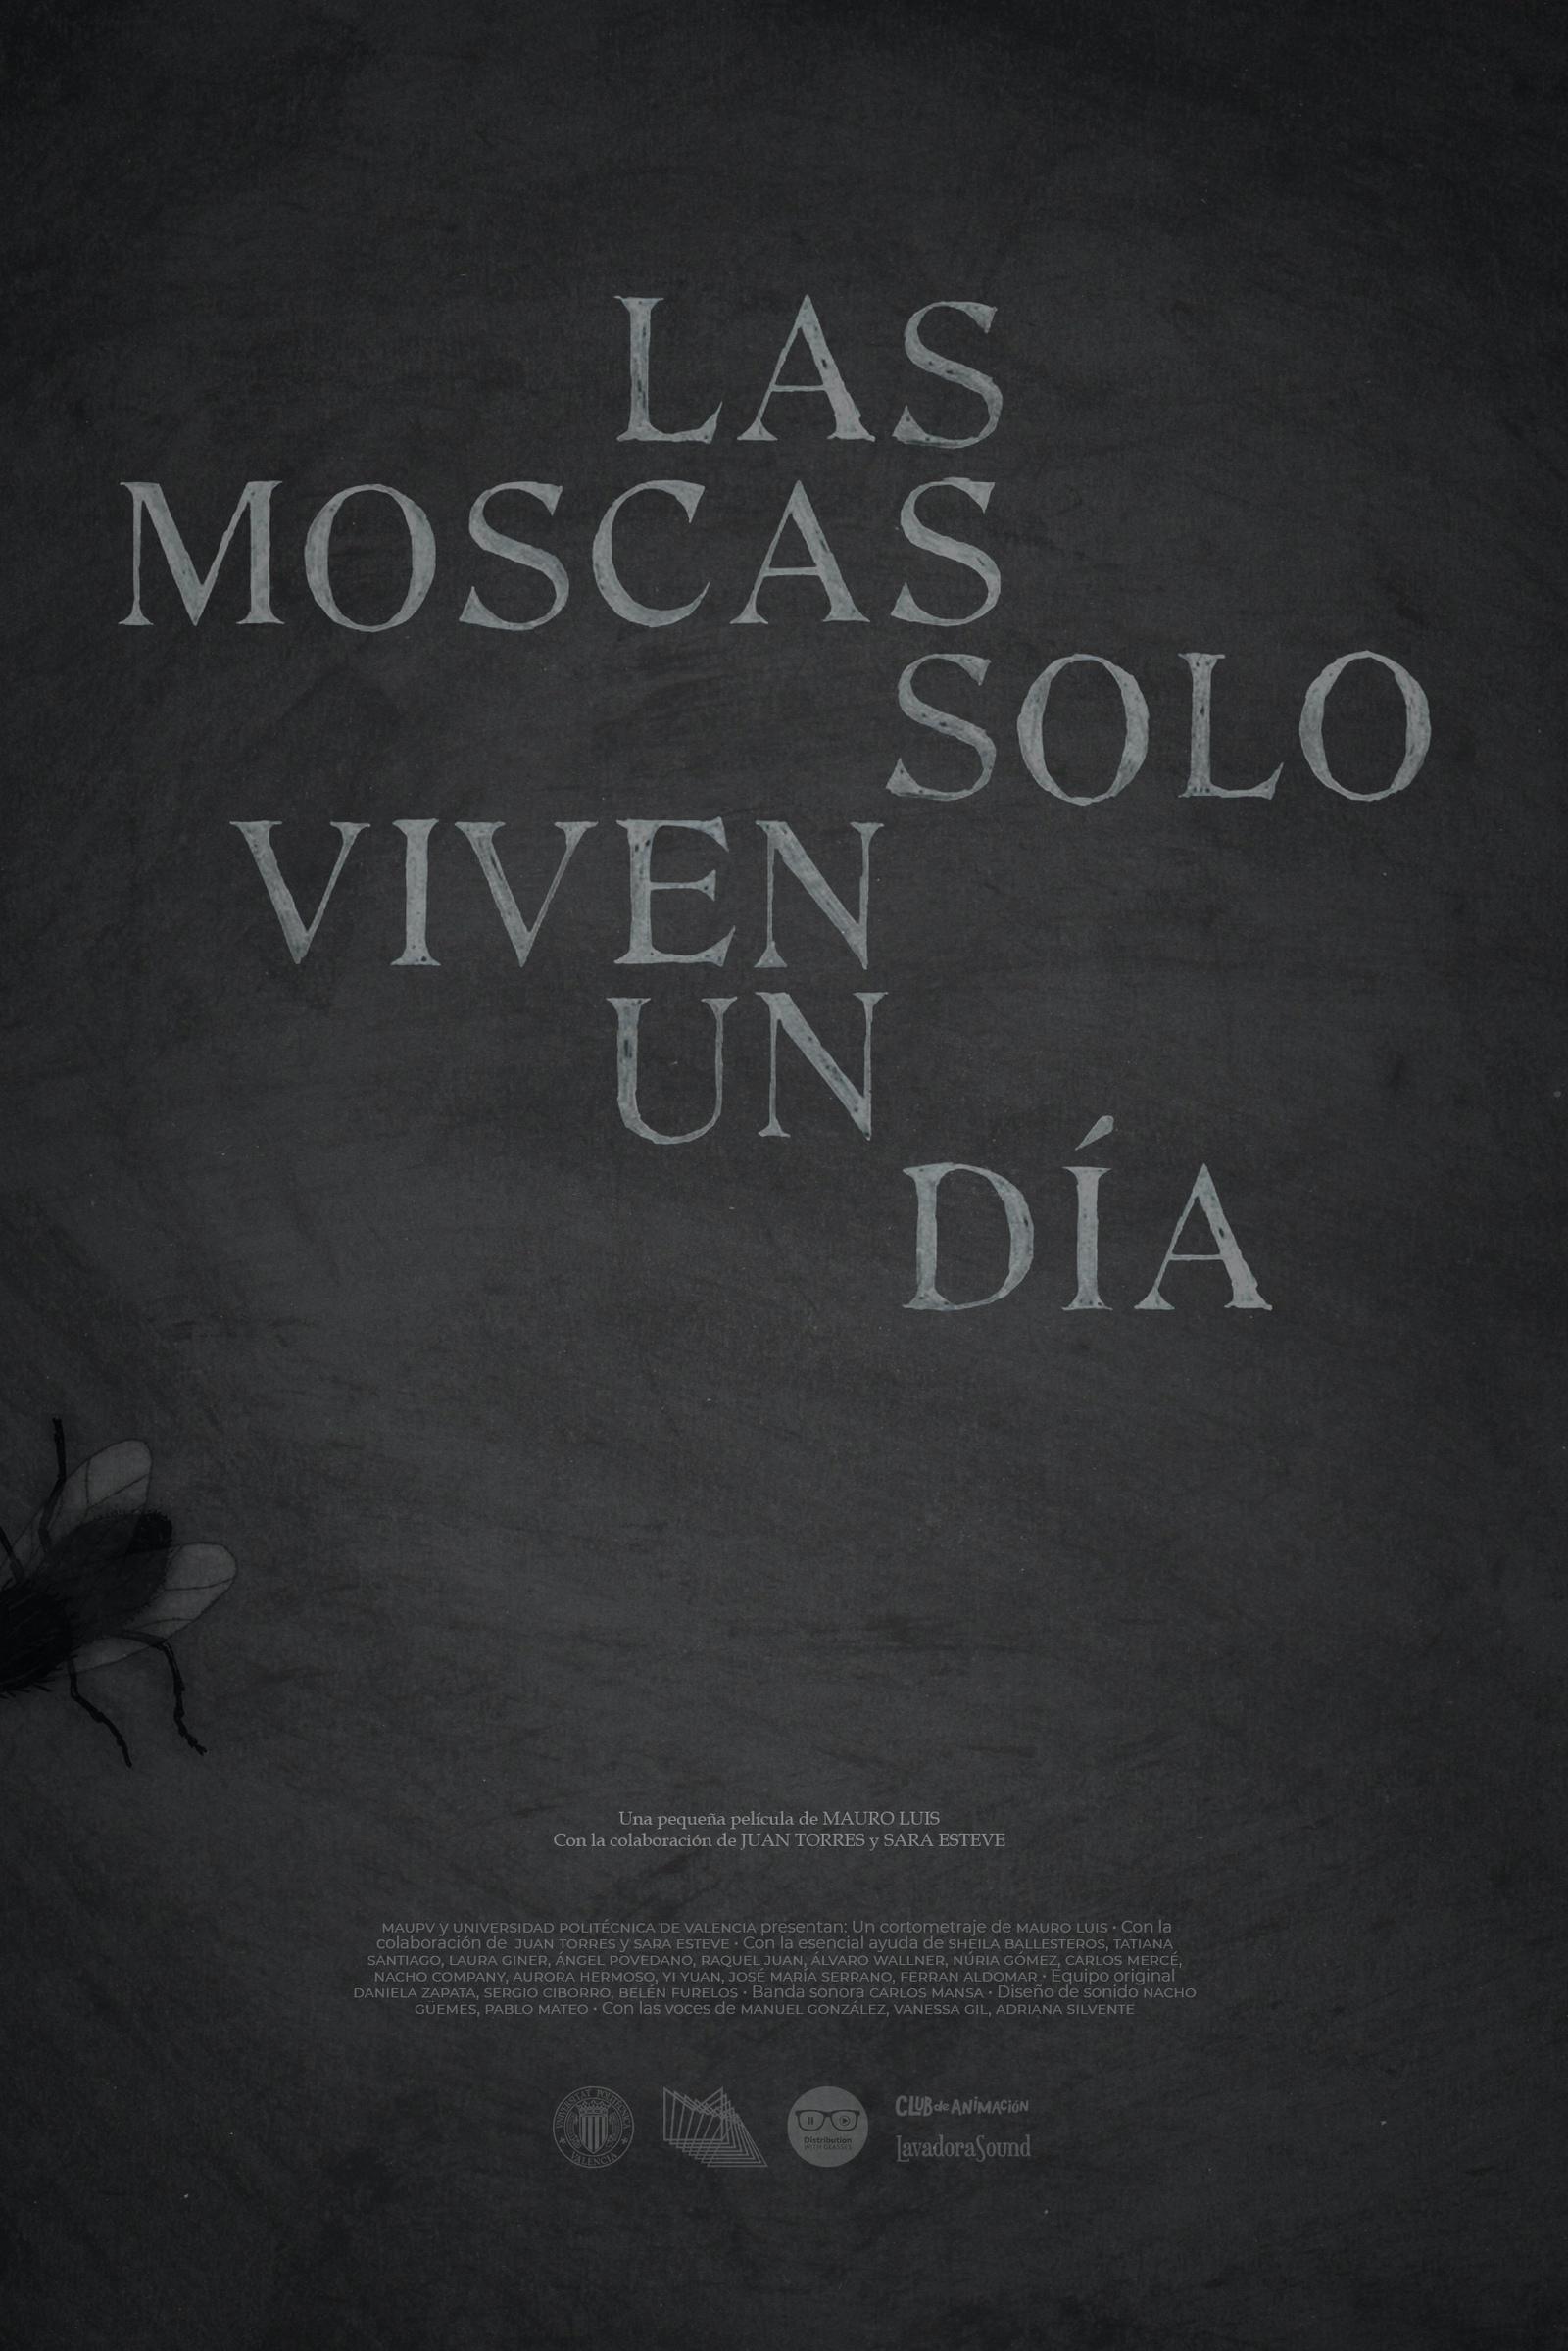 Las moscas solo viven un día (Flies only live one day)